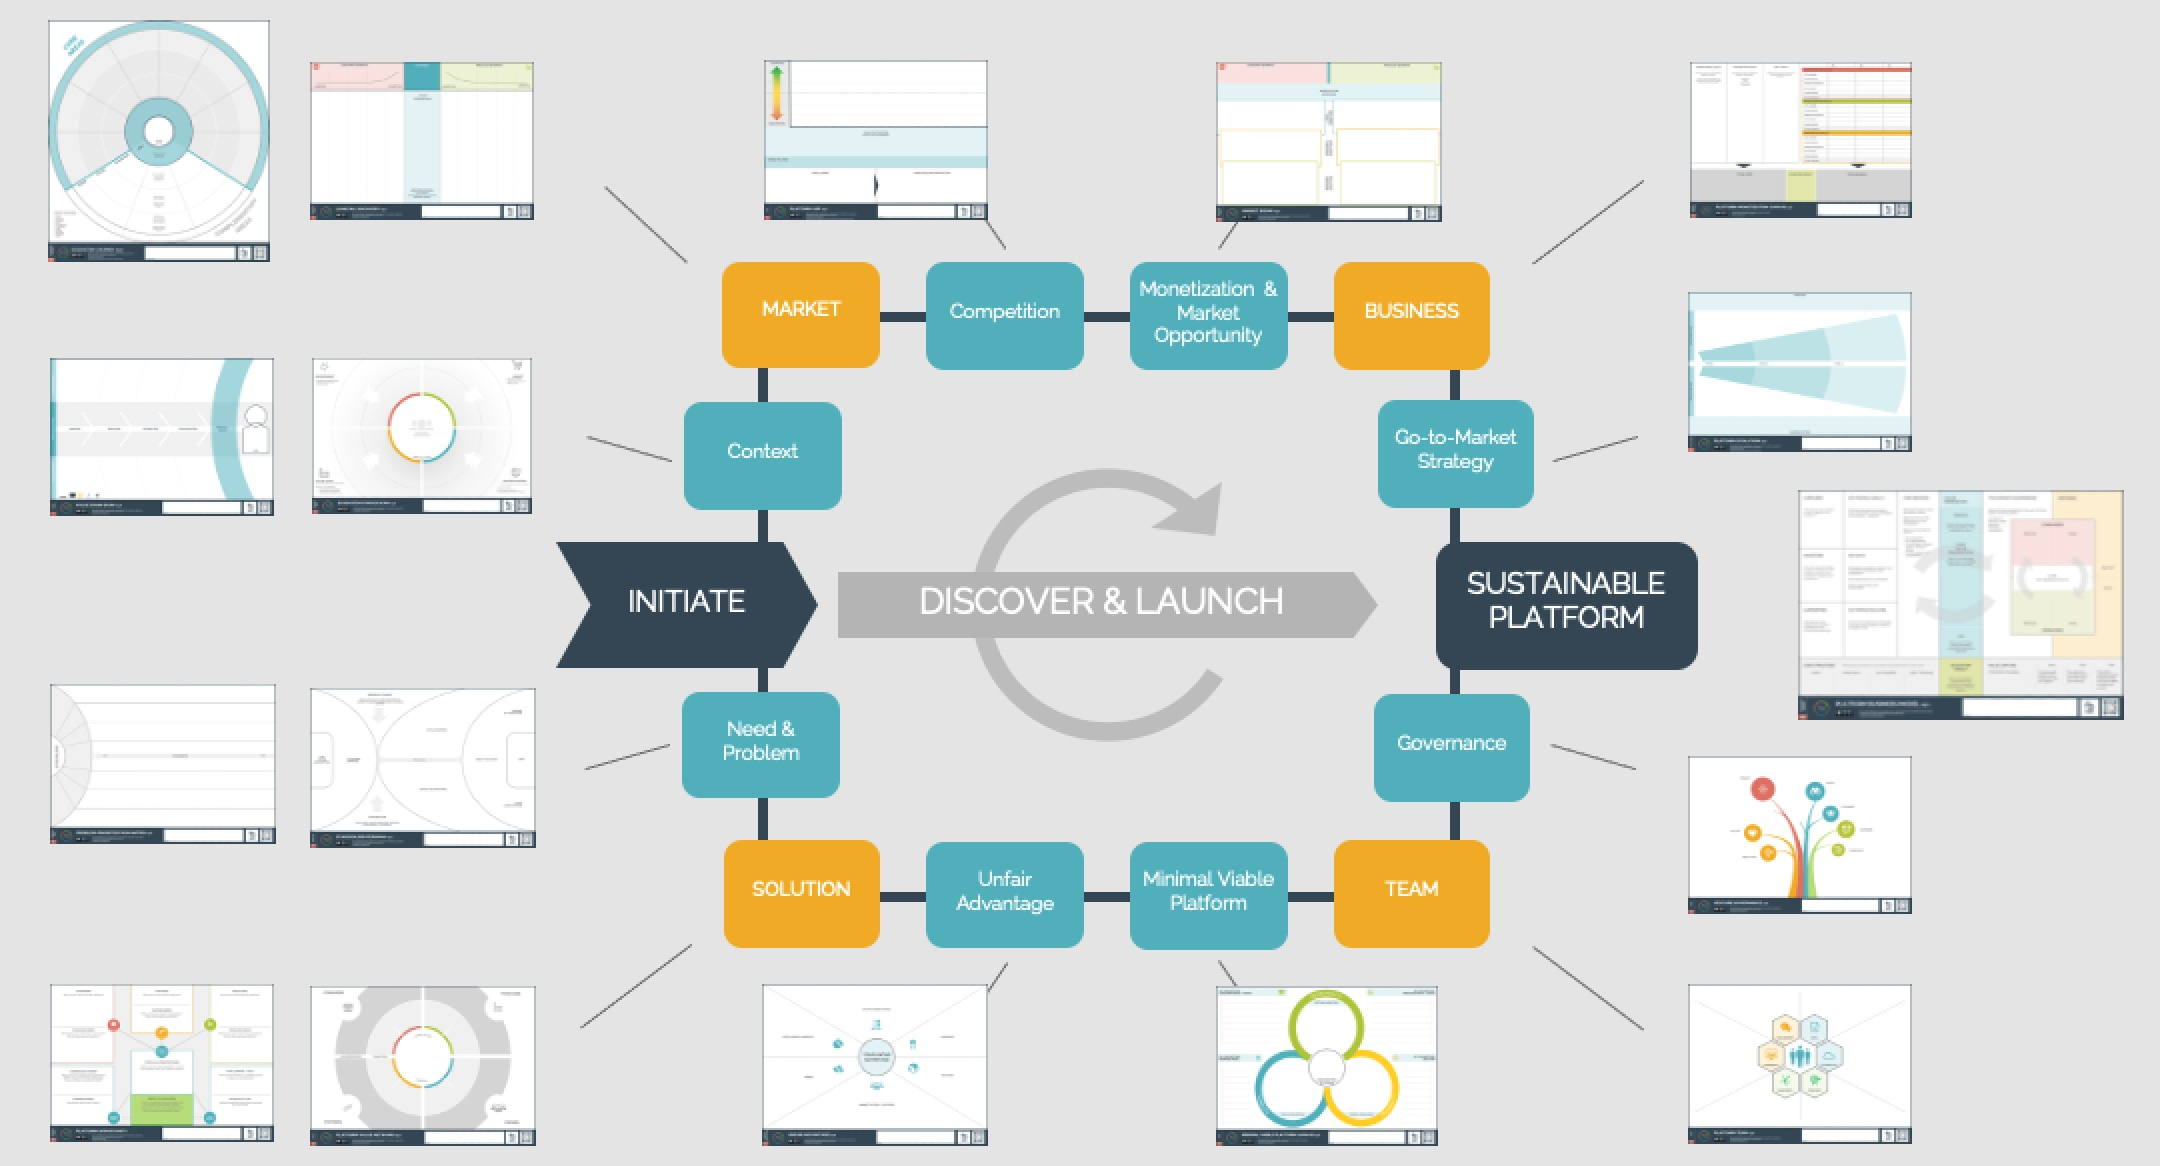 tools to build a platform